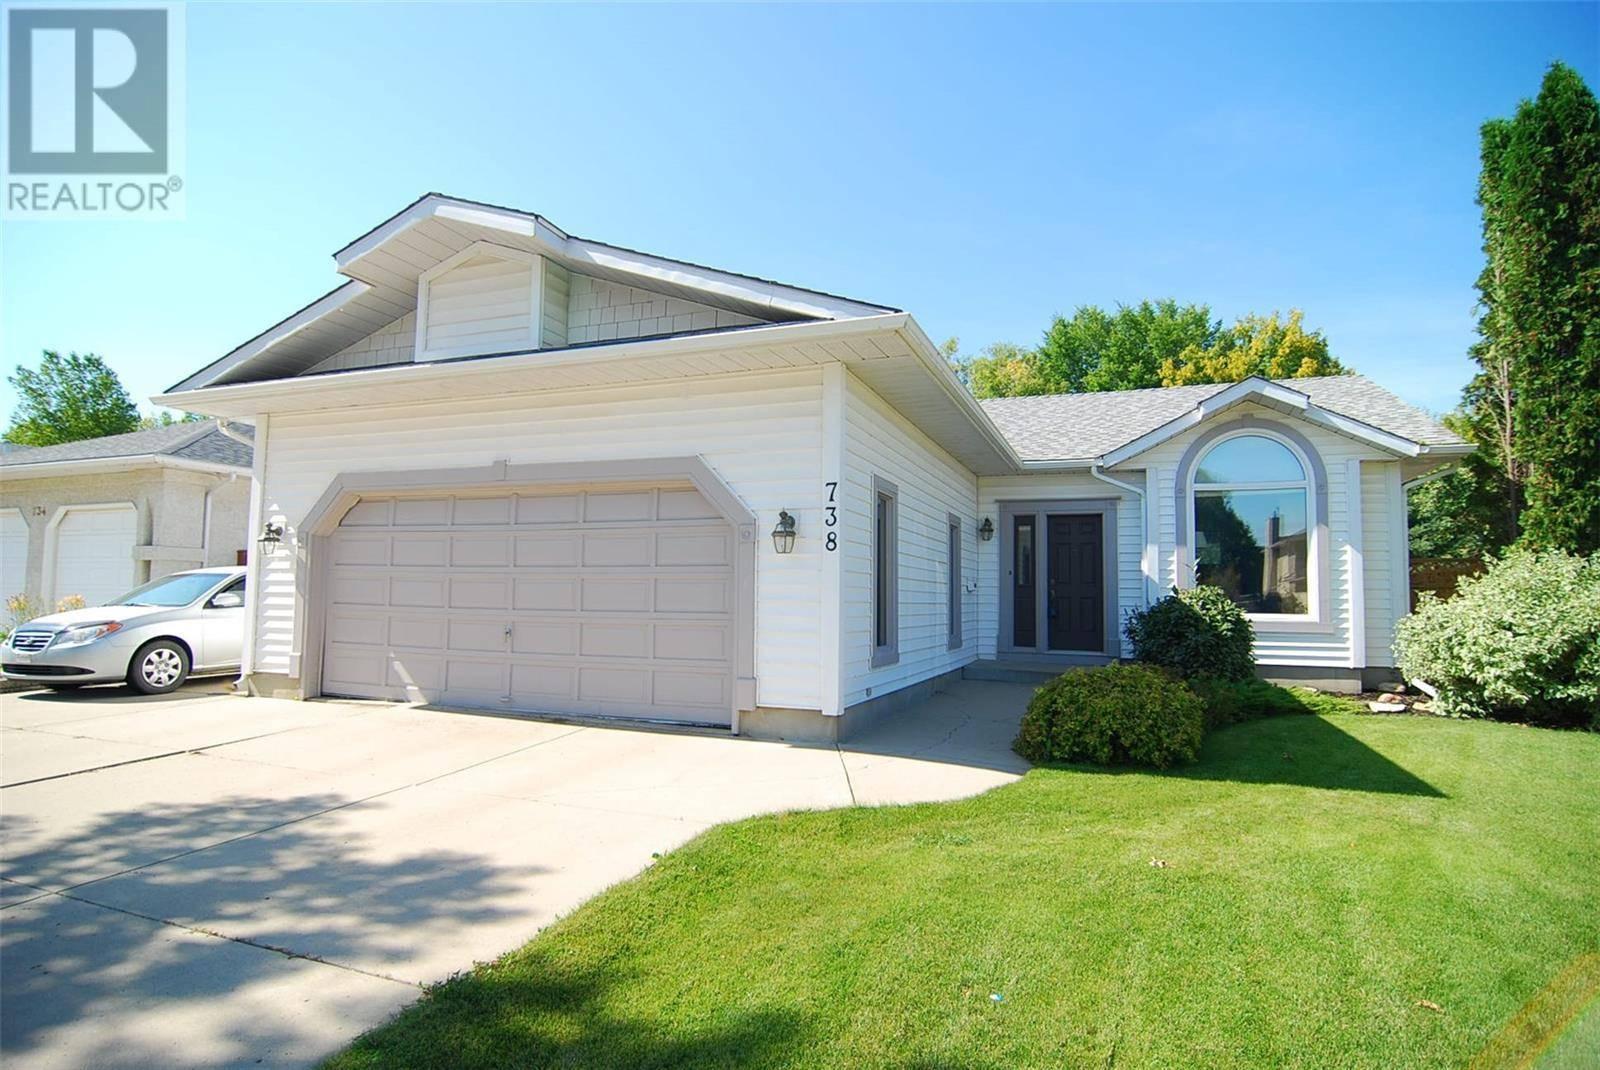 House for sale at 738 Cowley Rd Saskatoon Saskatchewan - MLS: SK784490